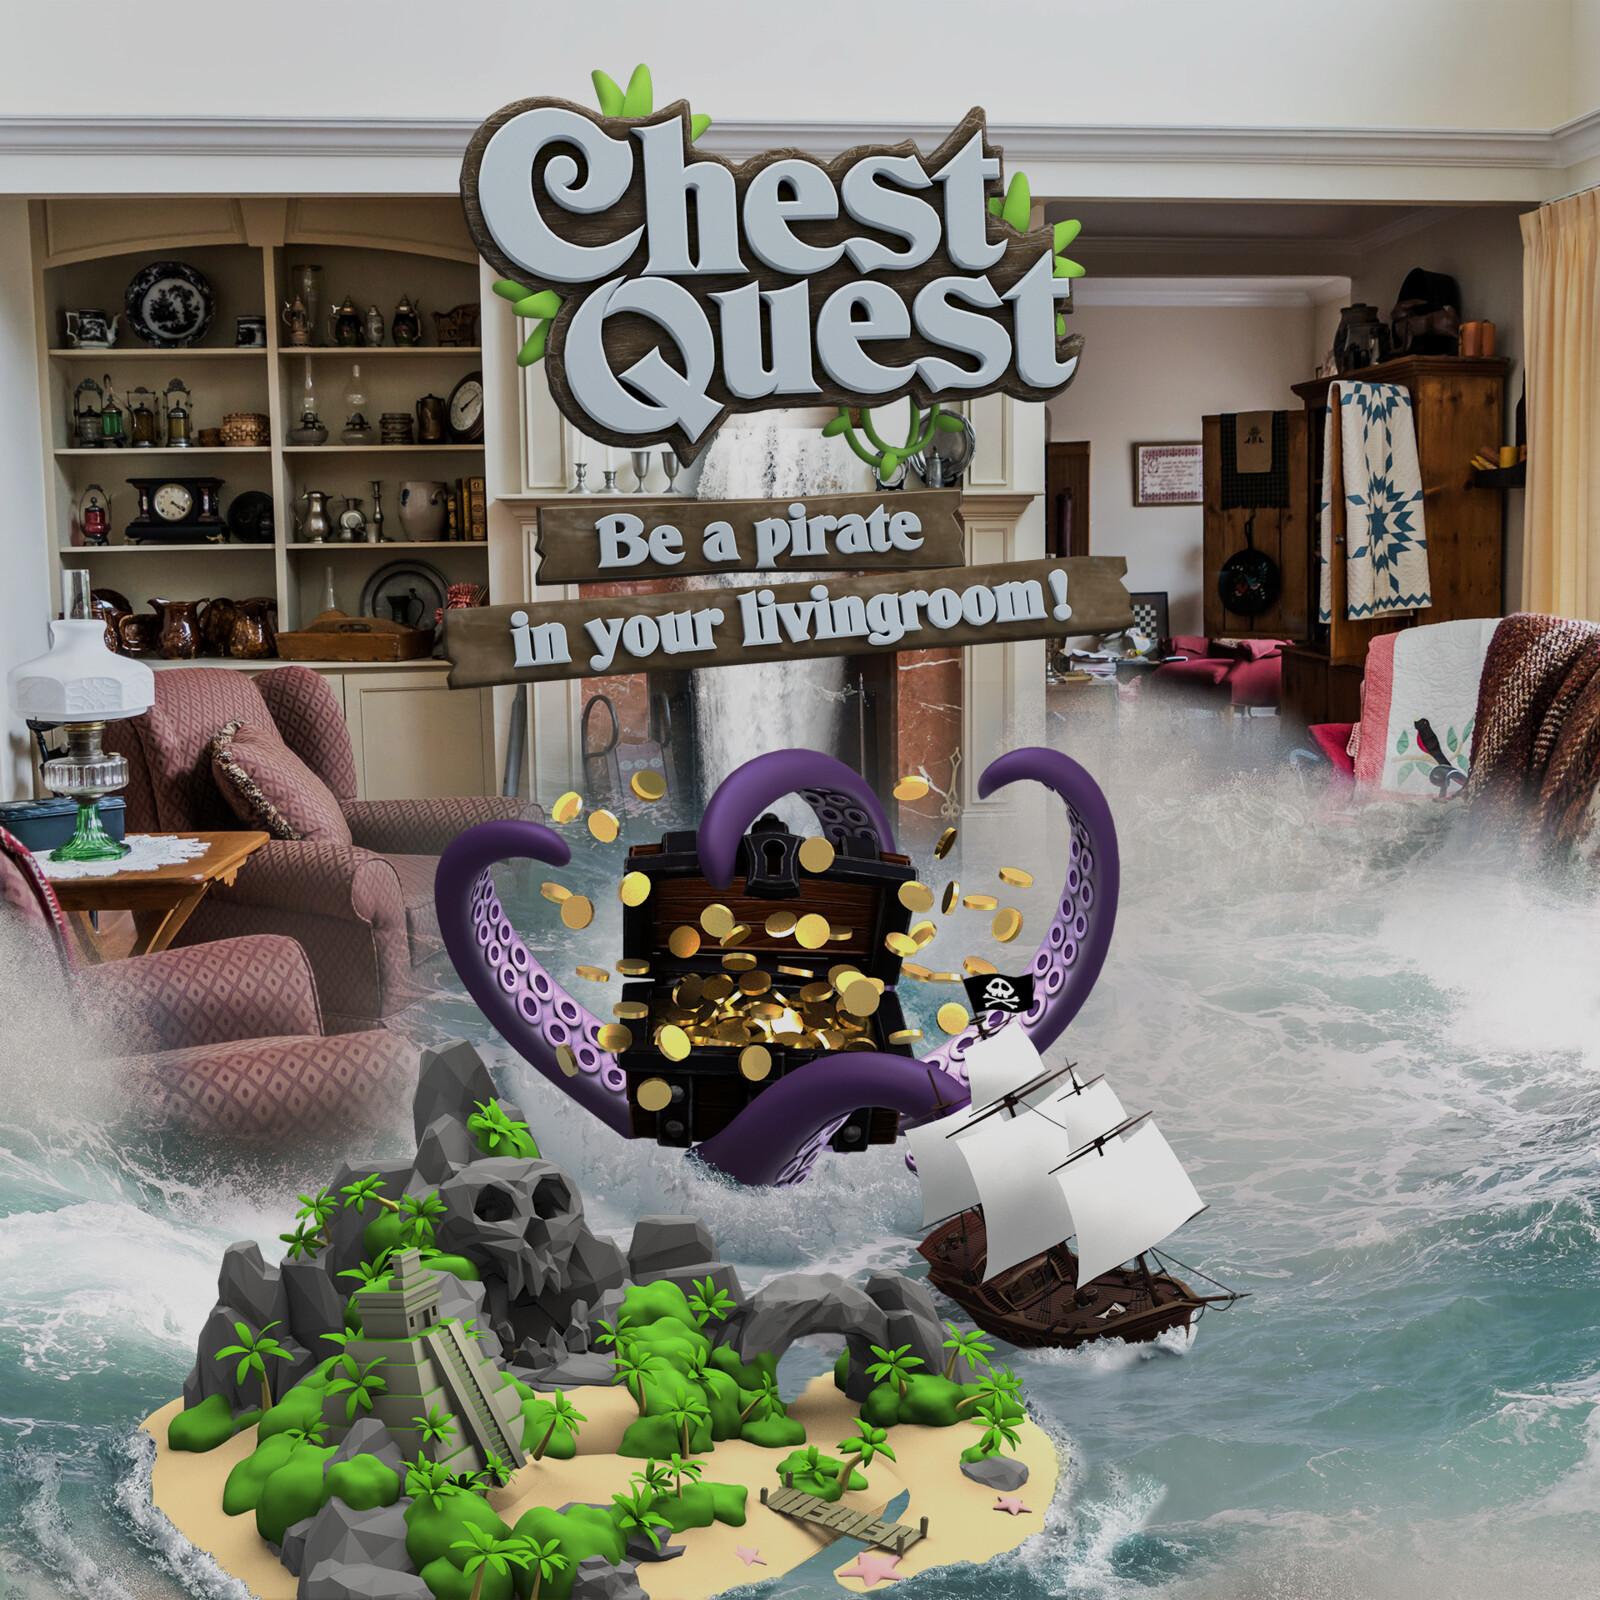 Chest Quest Promotional Image